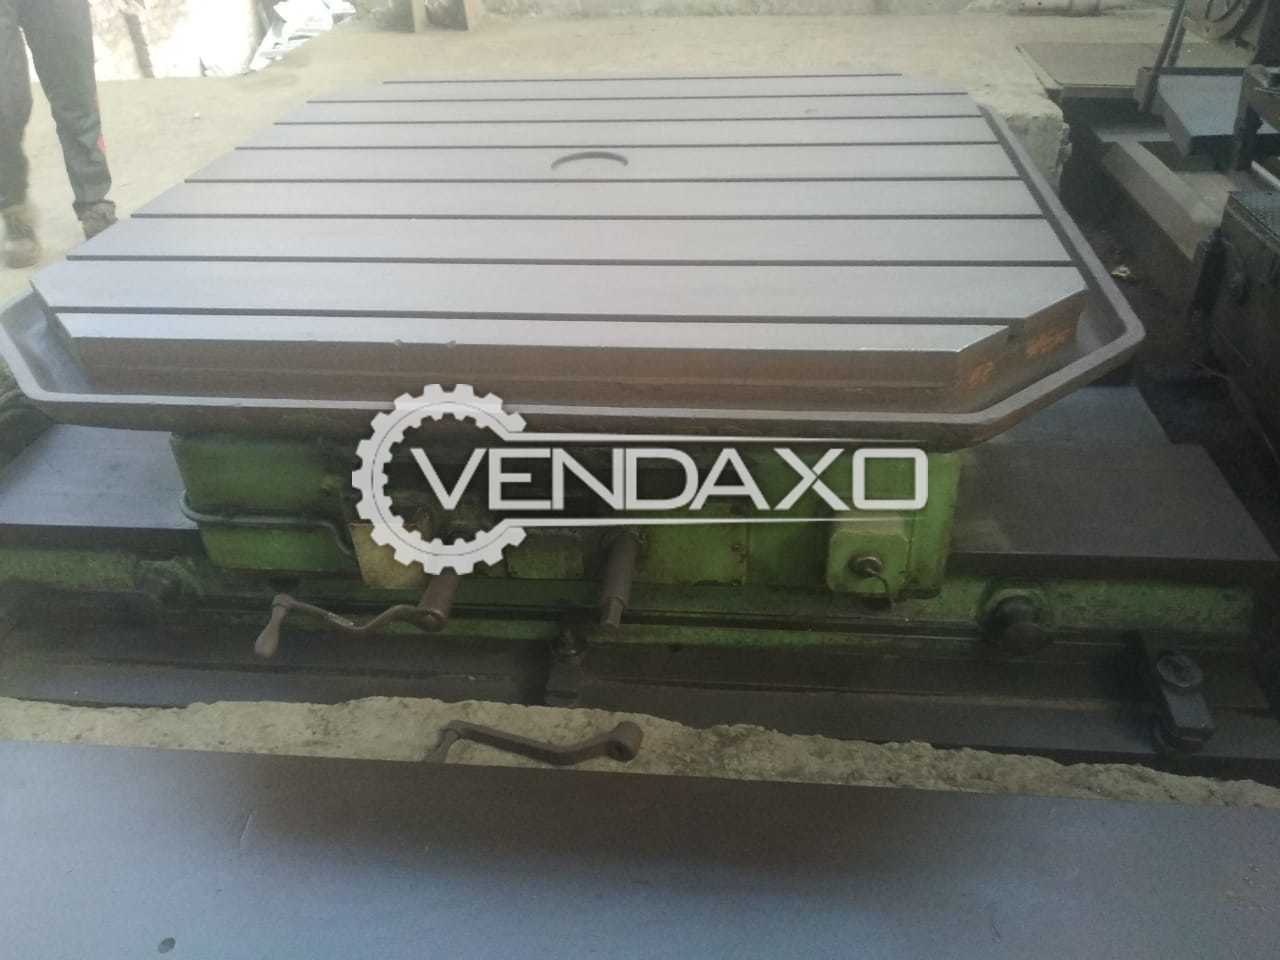 Available For Sale Skoda Make Rotary Table - Model E 20